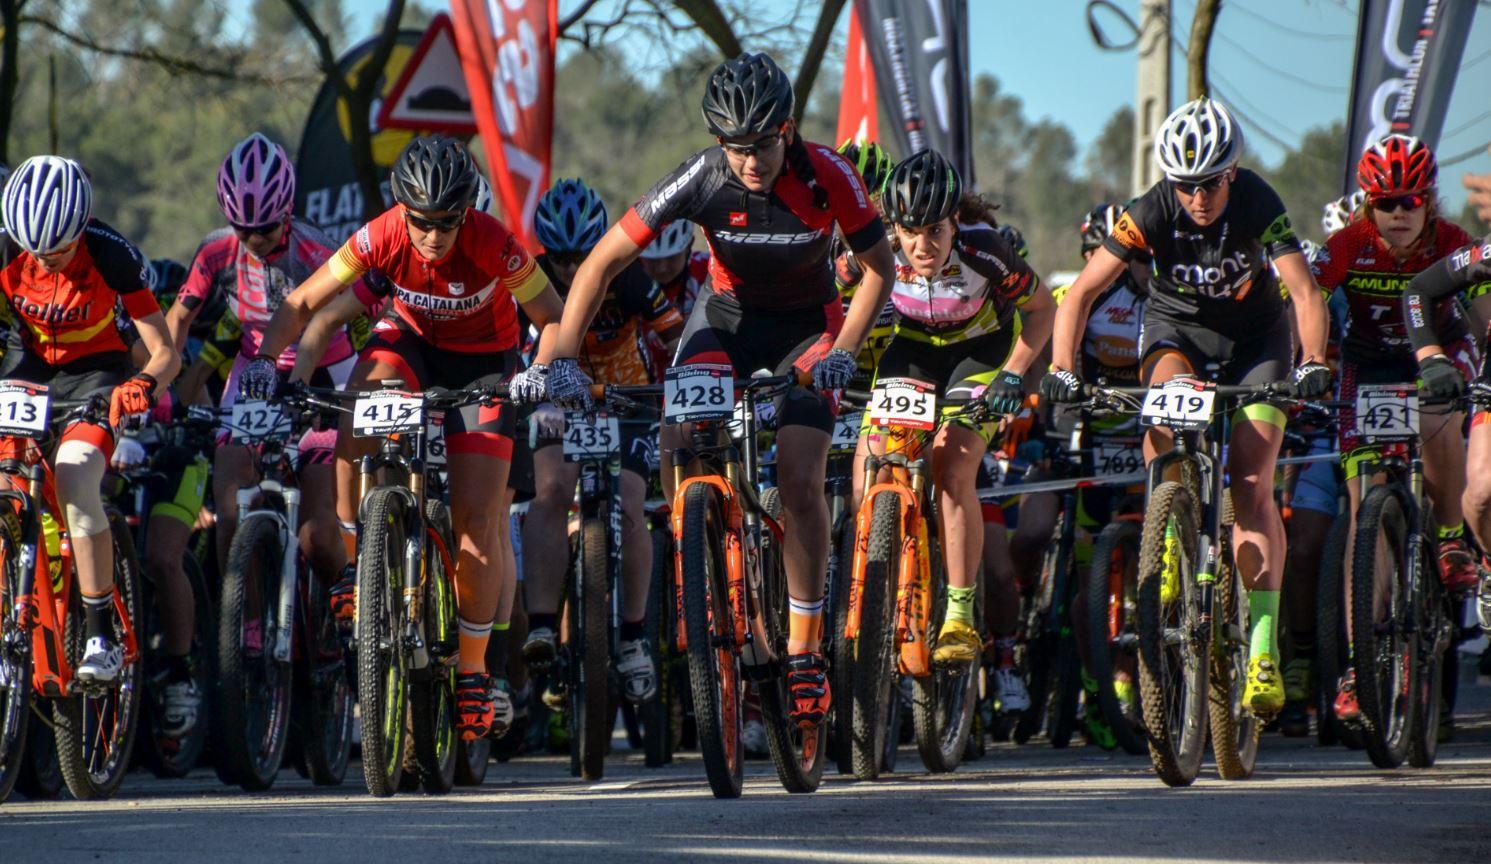 La Copa Catalana Internacional Biking Point de Corr� d'Amunt dar� continuidad al mejor XCO